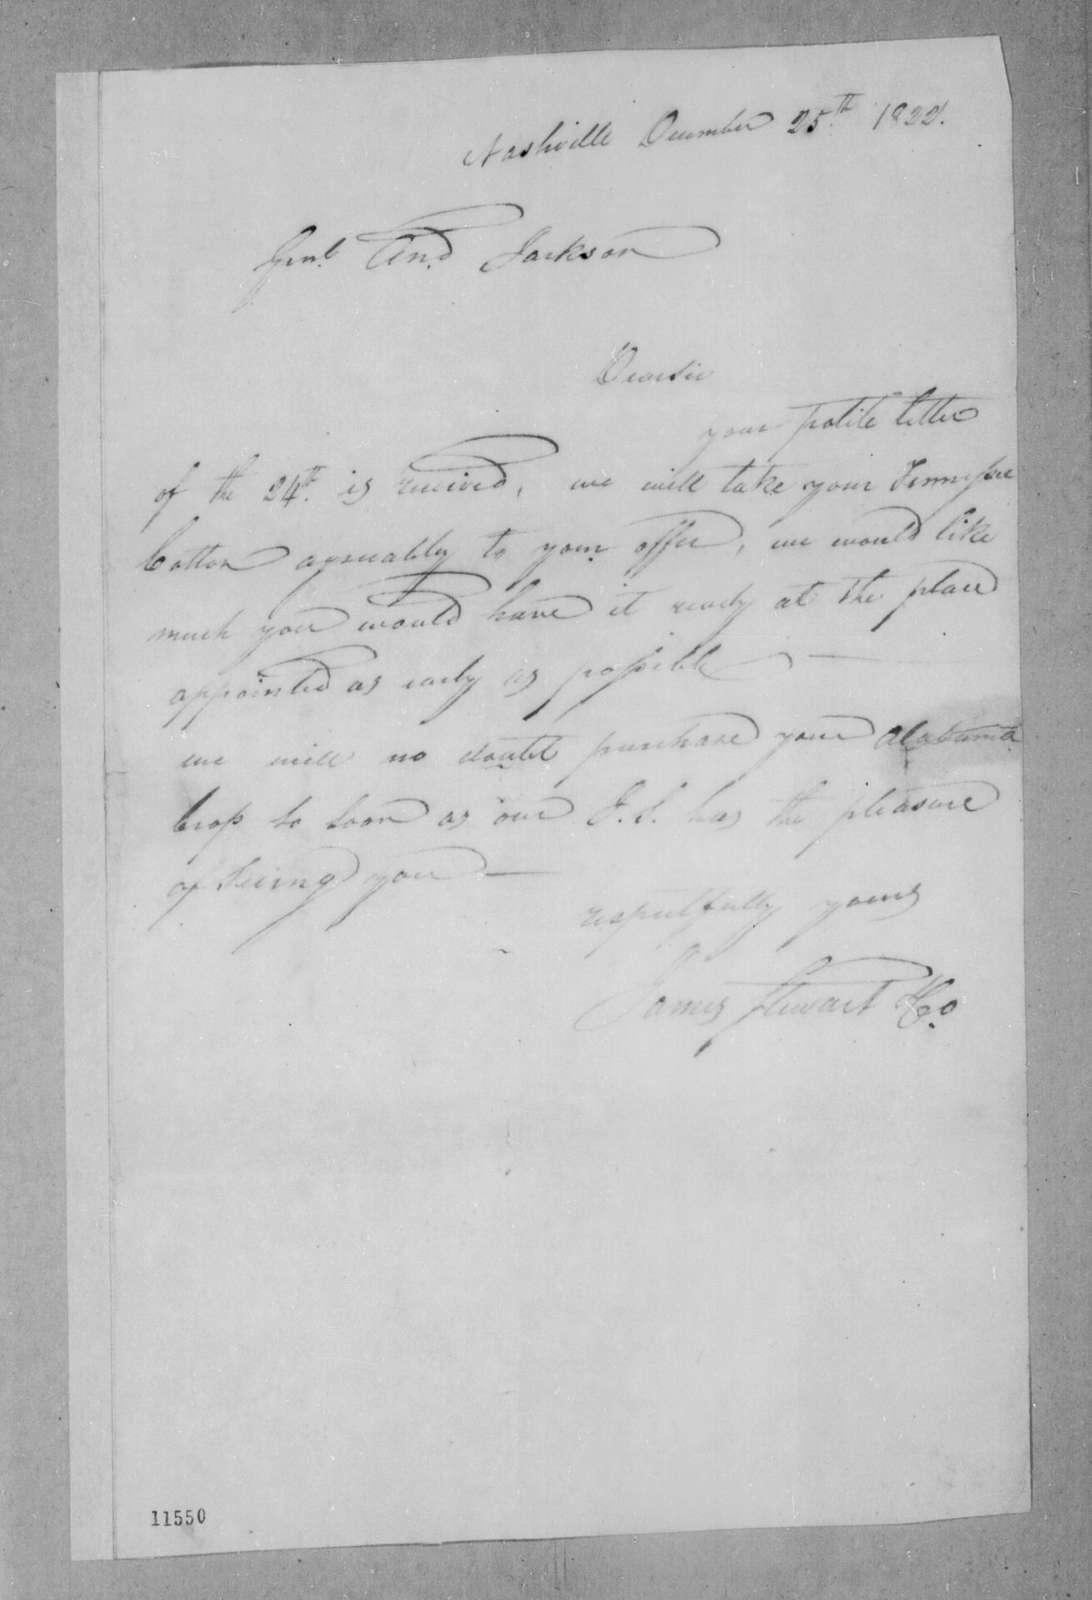 James Stewart & Co. to Andrew Jackson, December 25, 1822